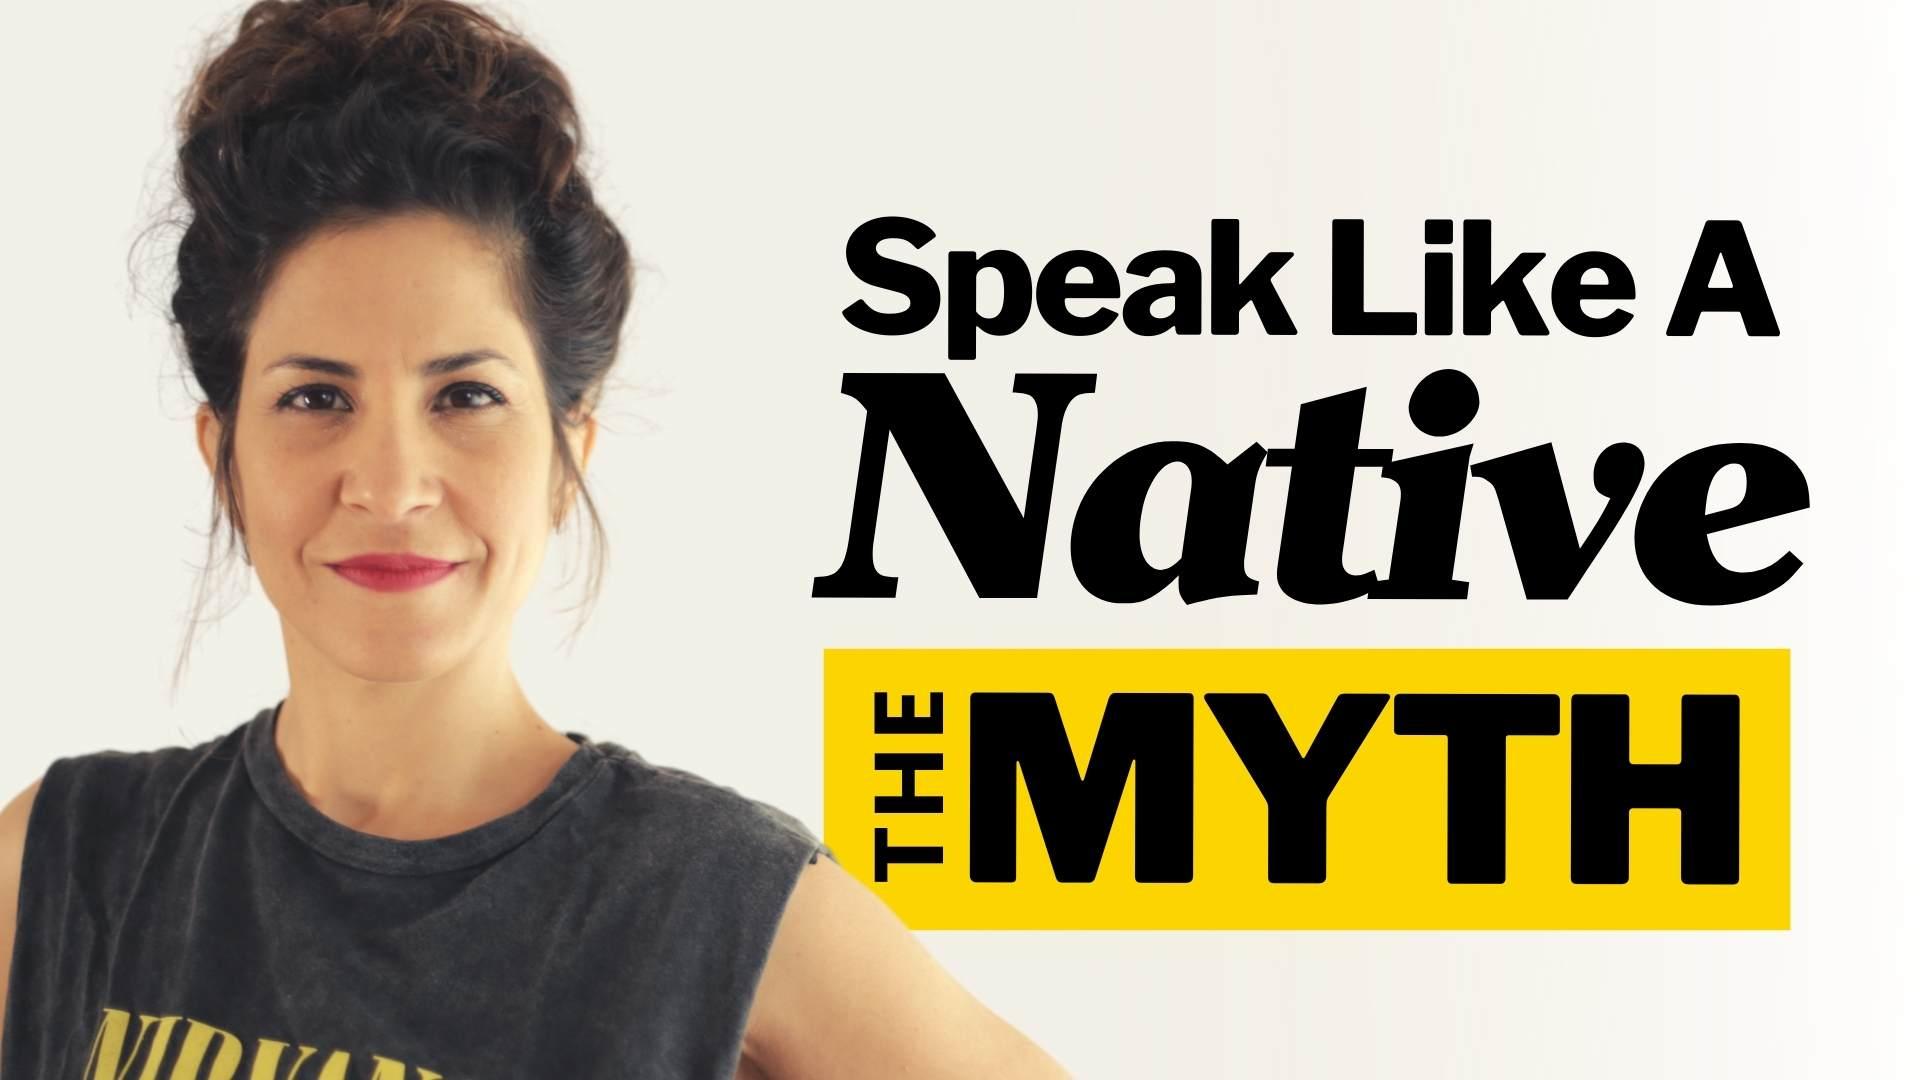 Speak Like a Native Myth